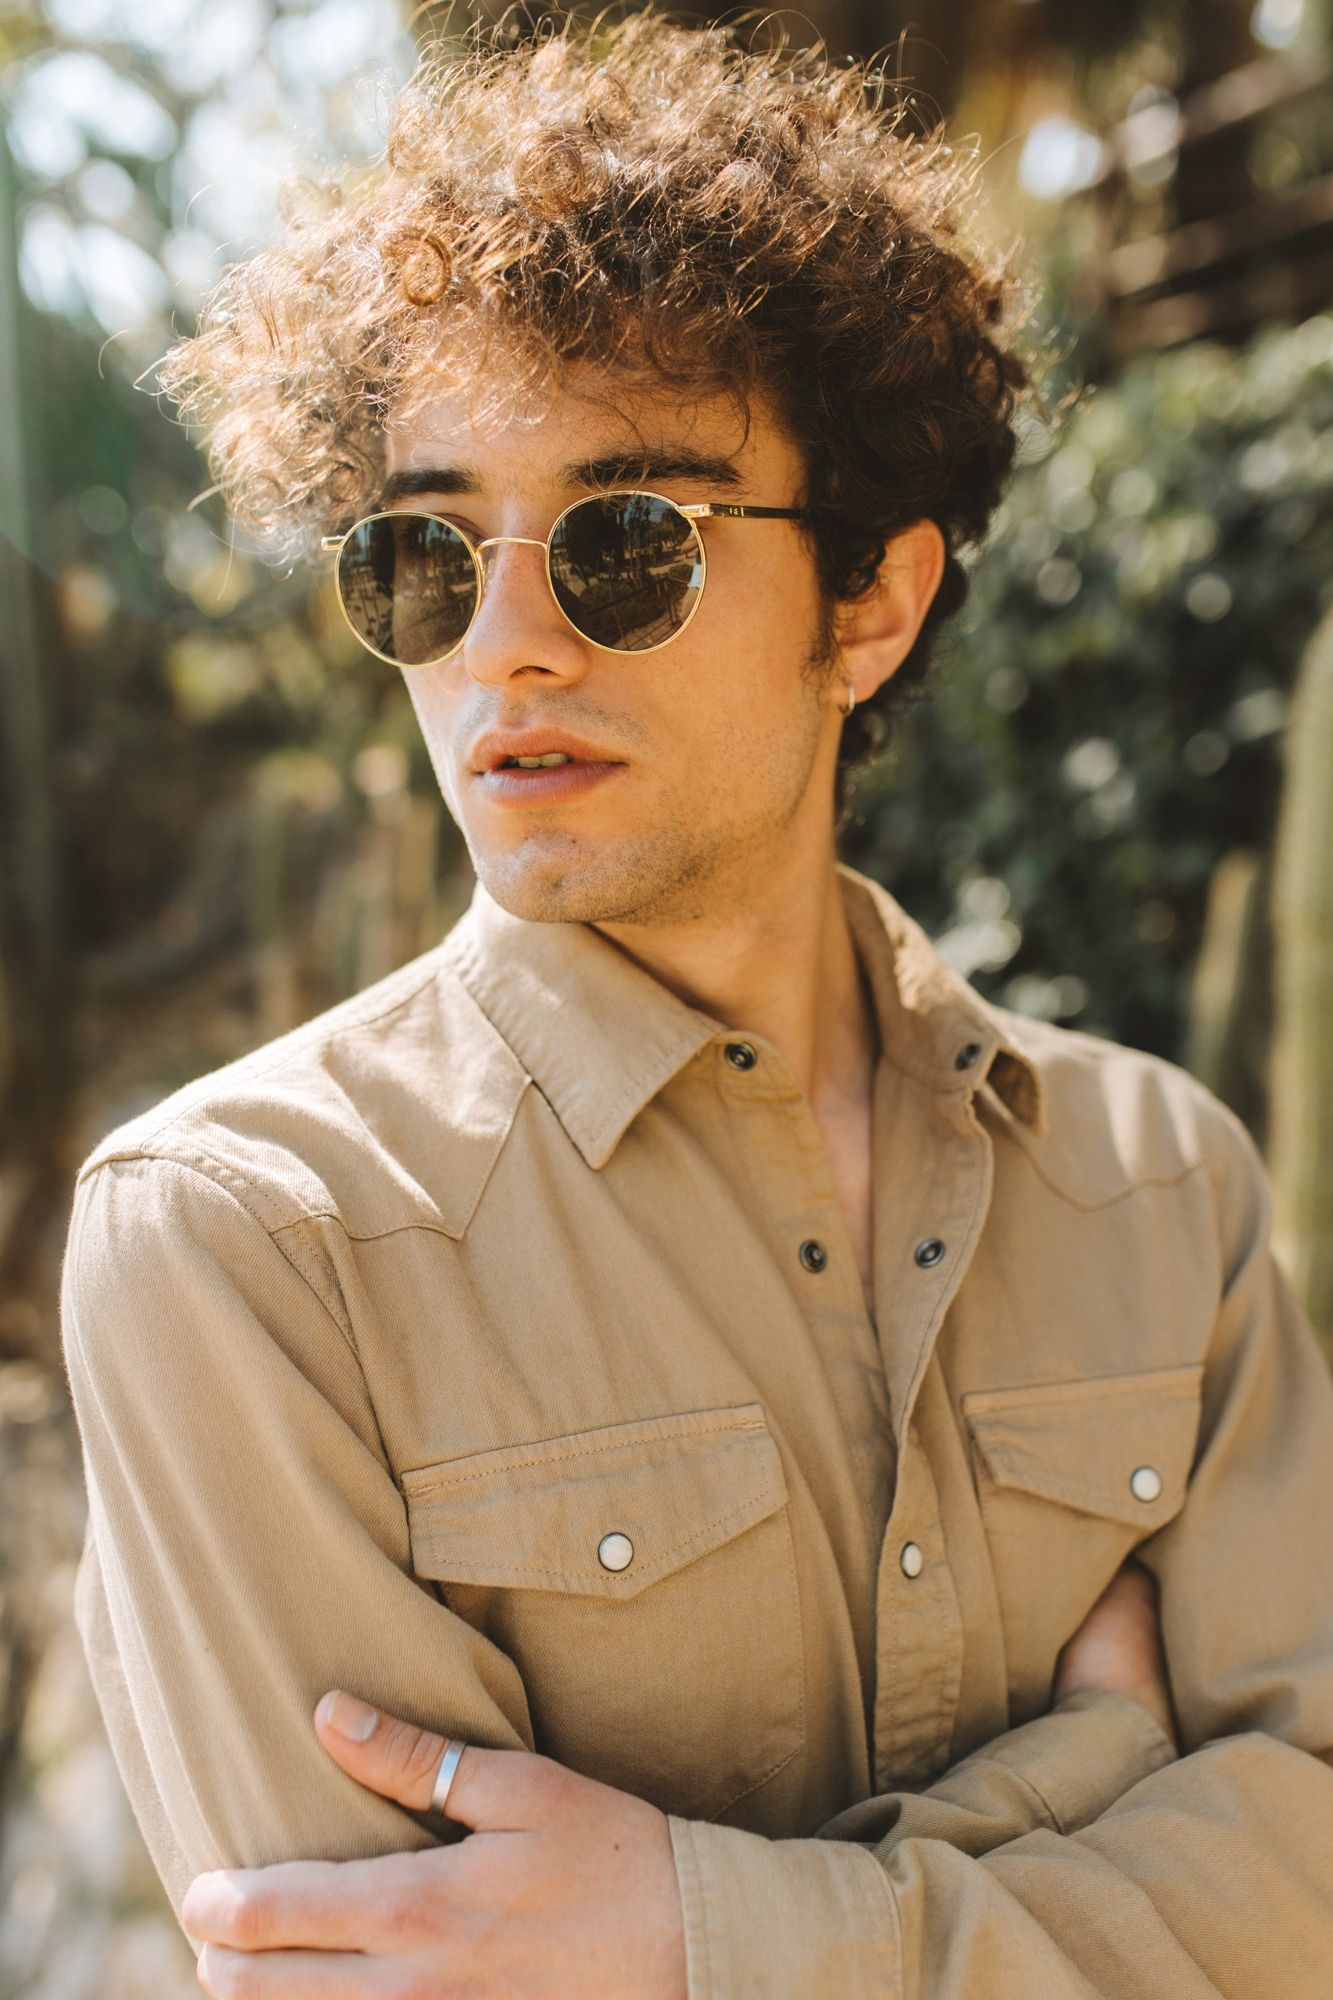 Top Picks For Him In 2020 Mens Sunglasses Mens Sunglasses Fashion Sunglasses